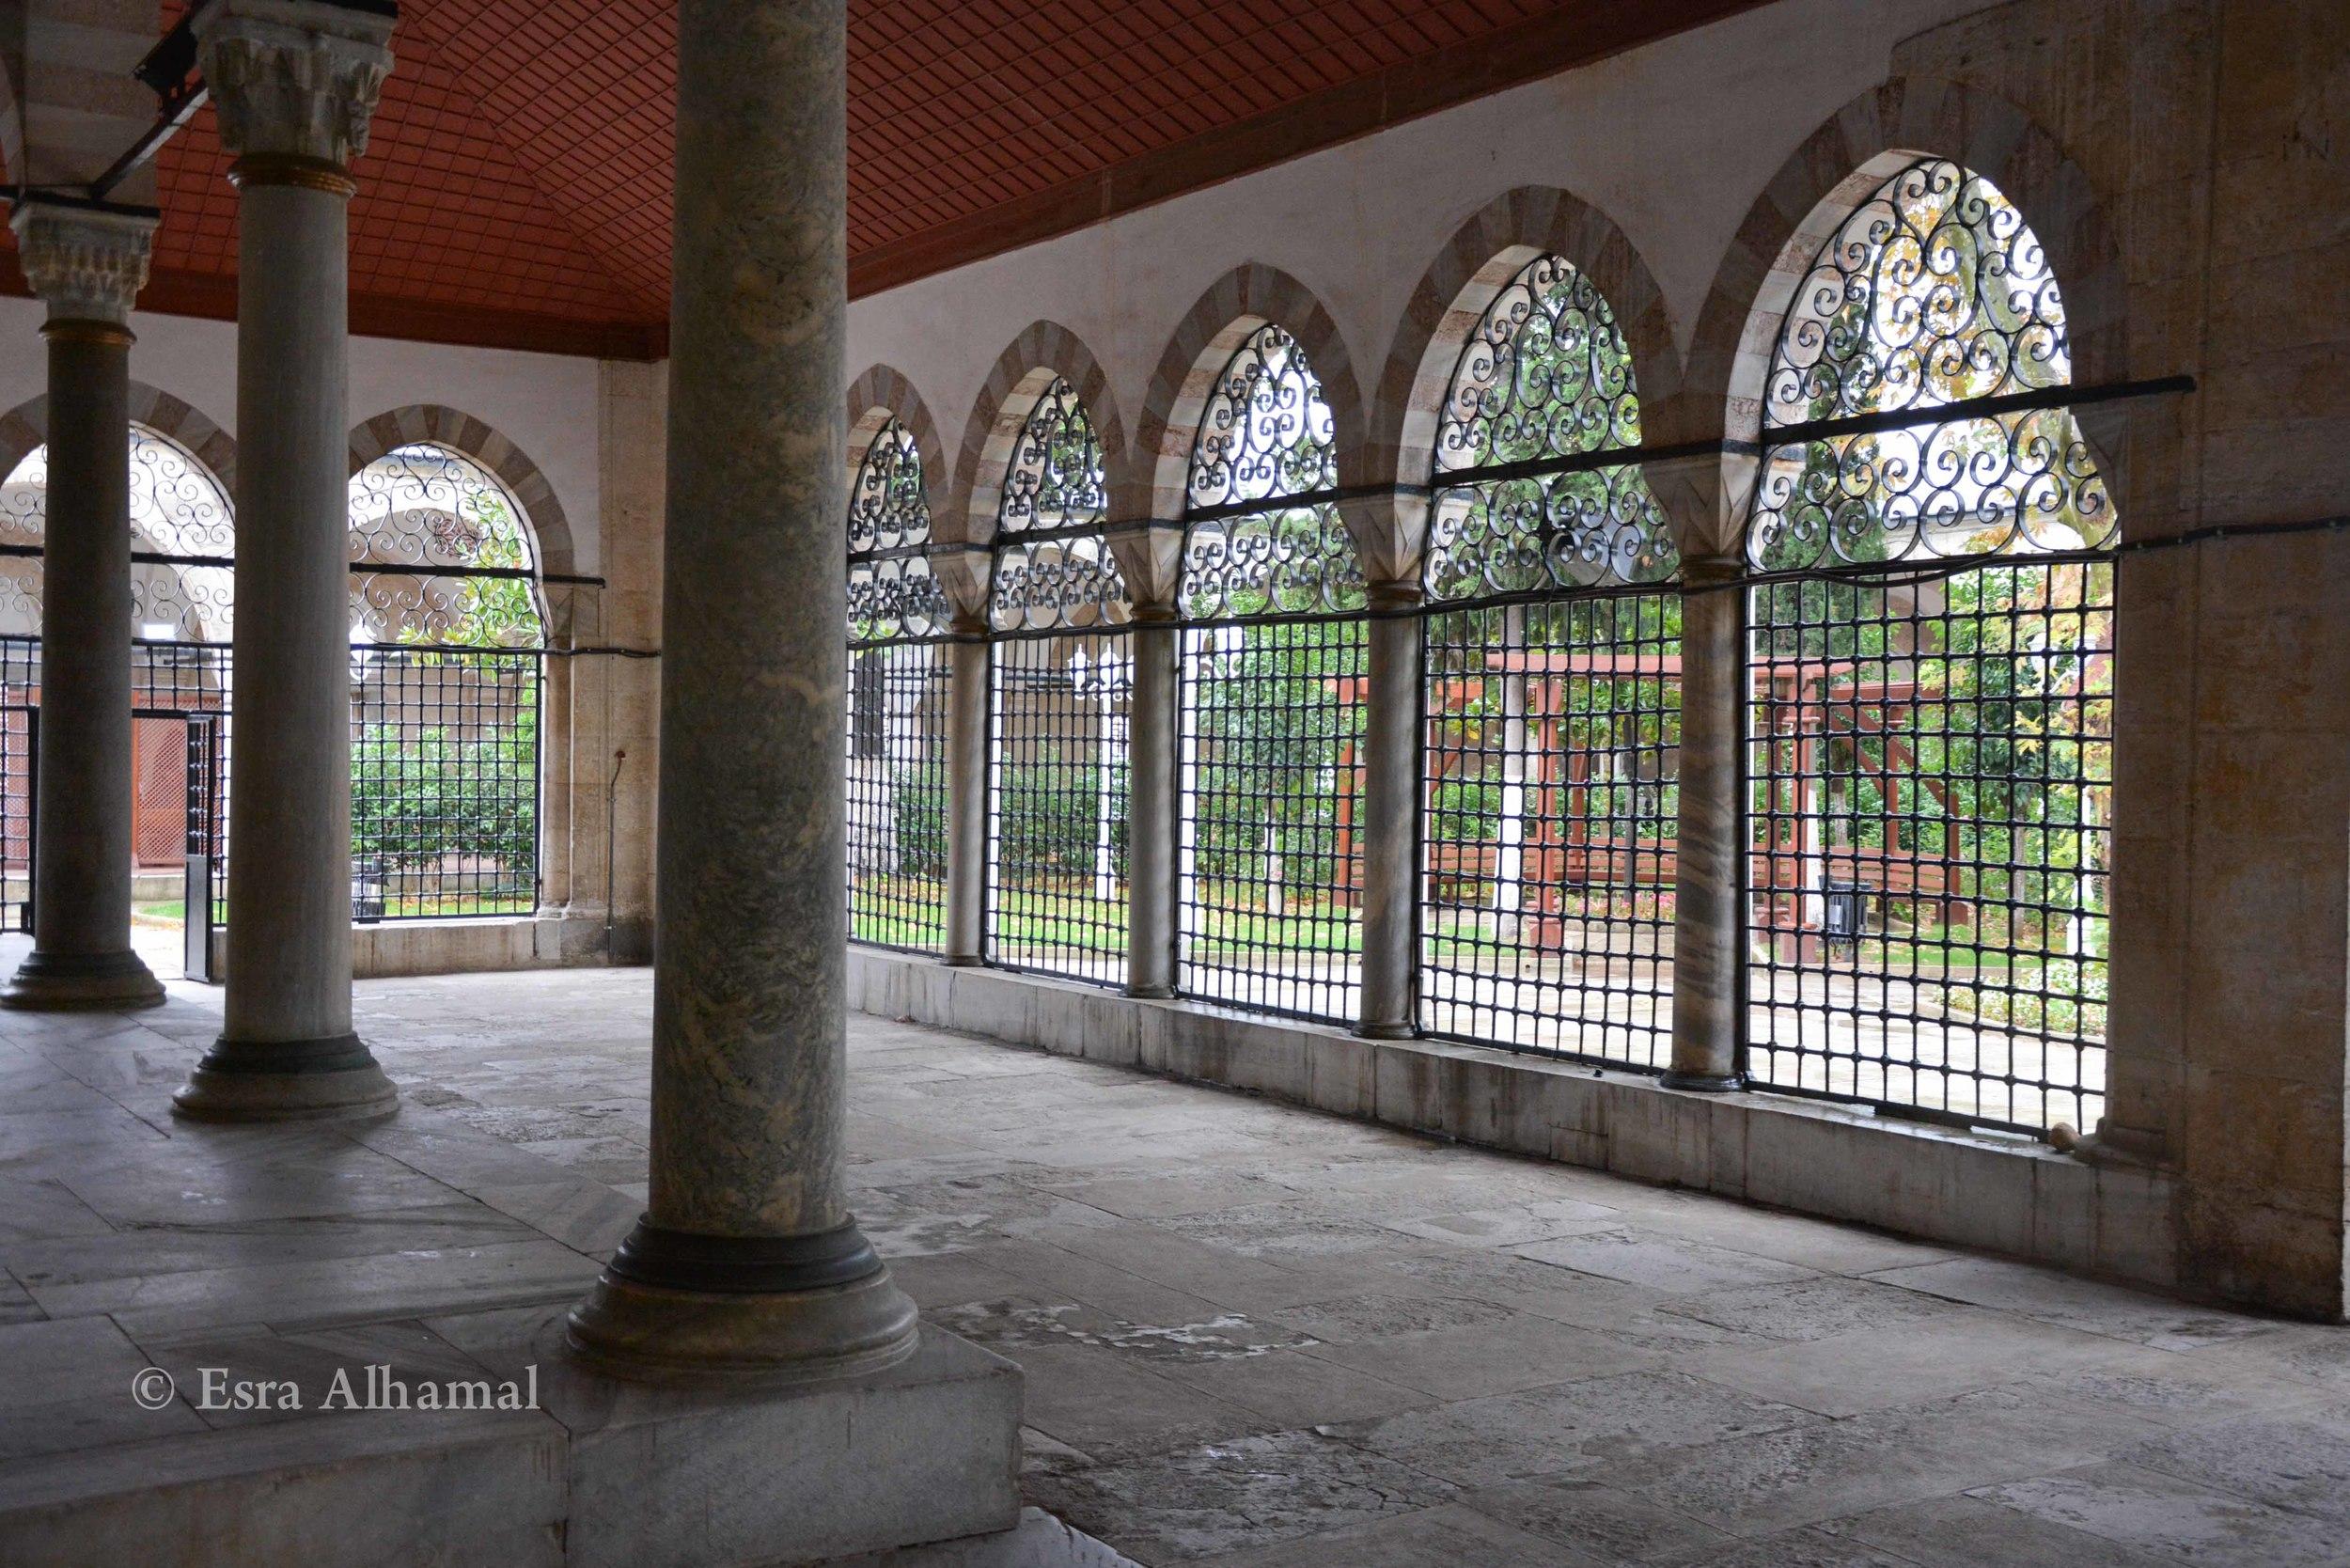 Atik Valide Mosque Courtyard